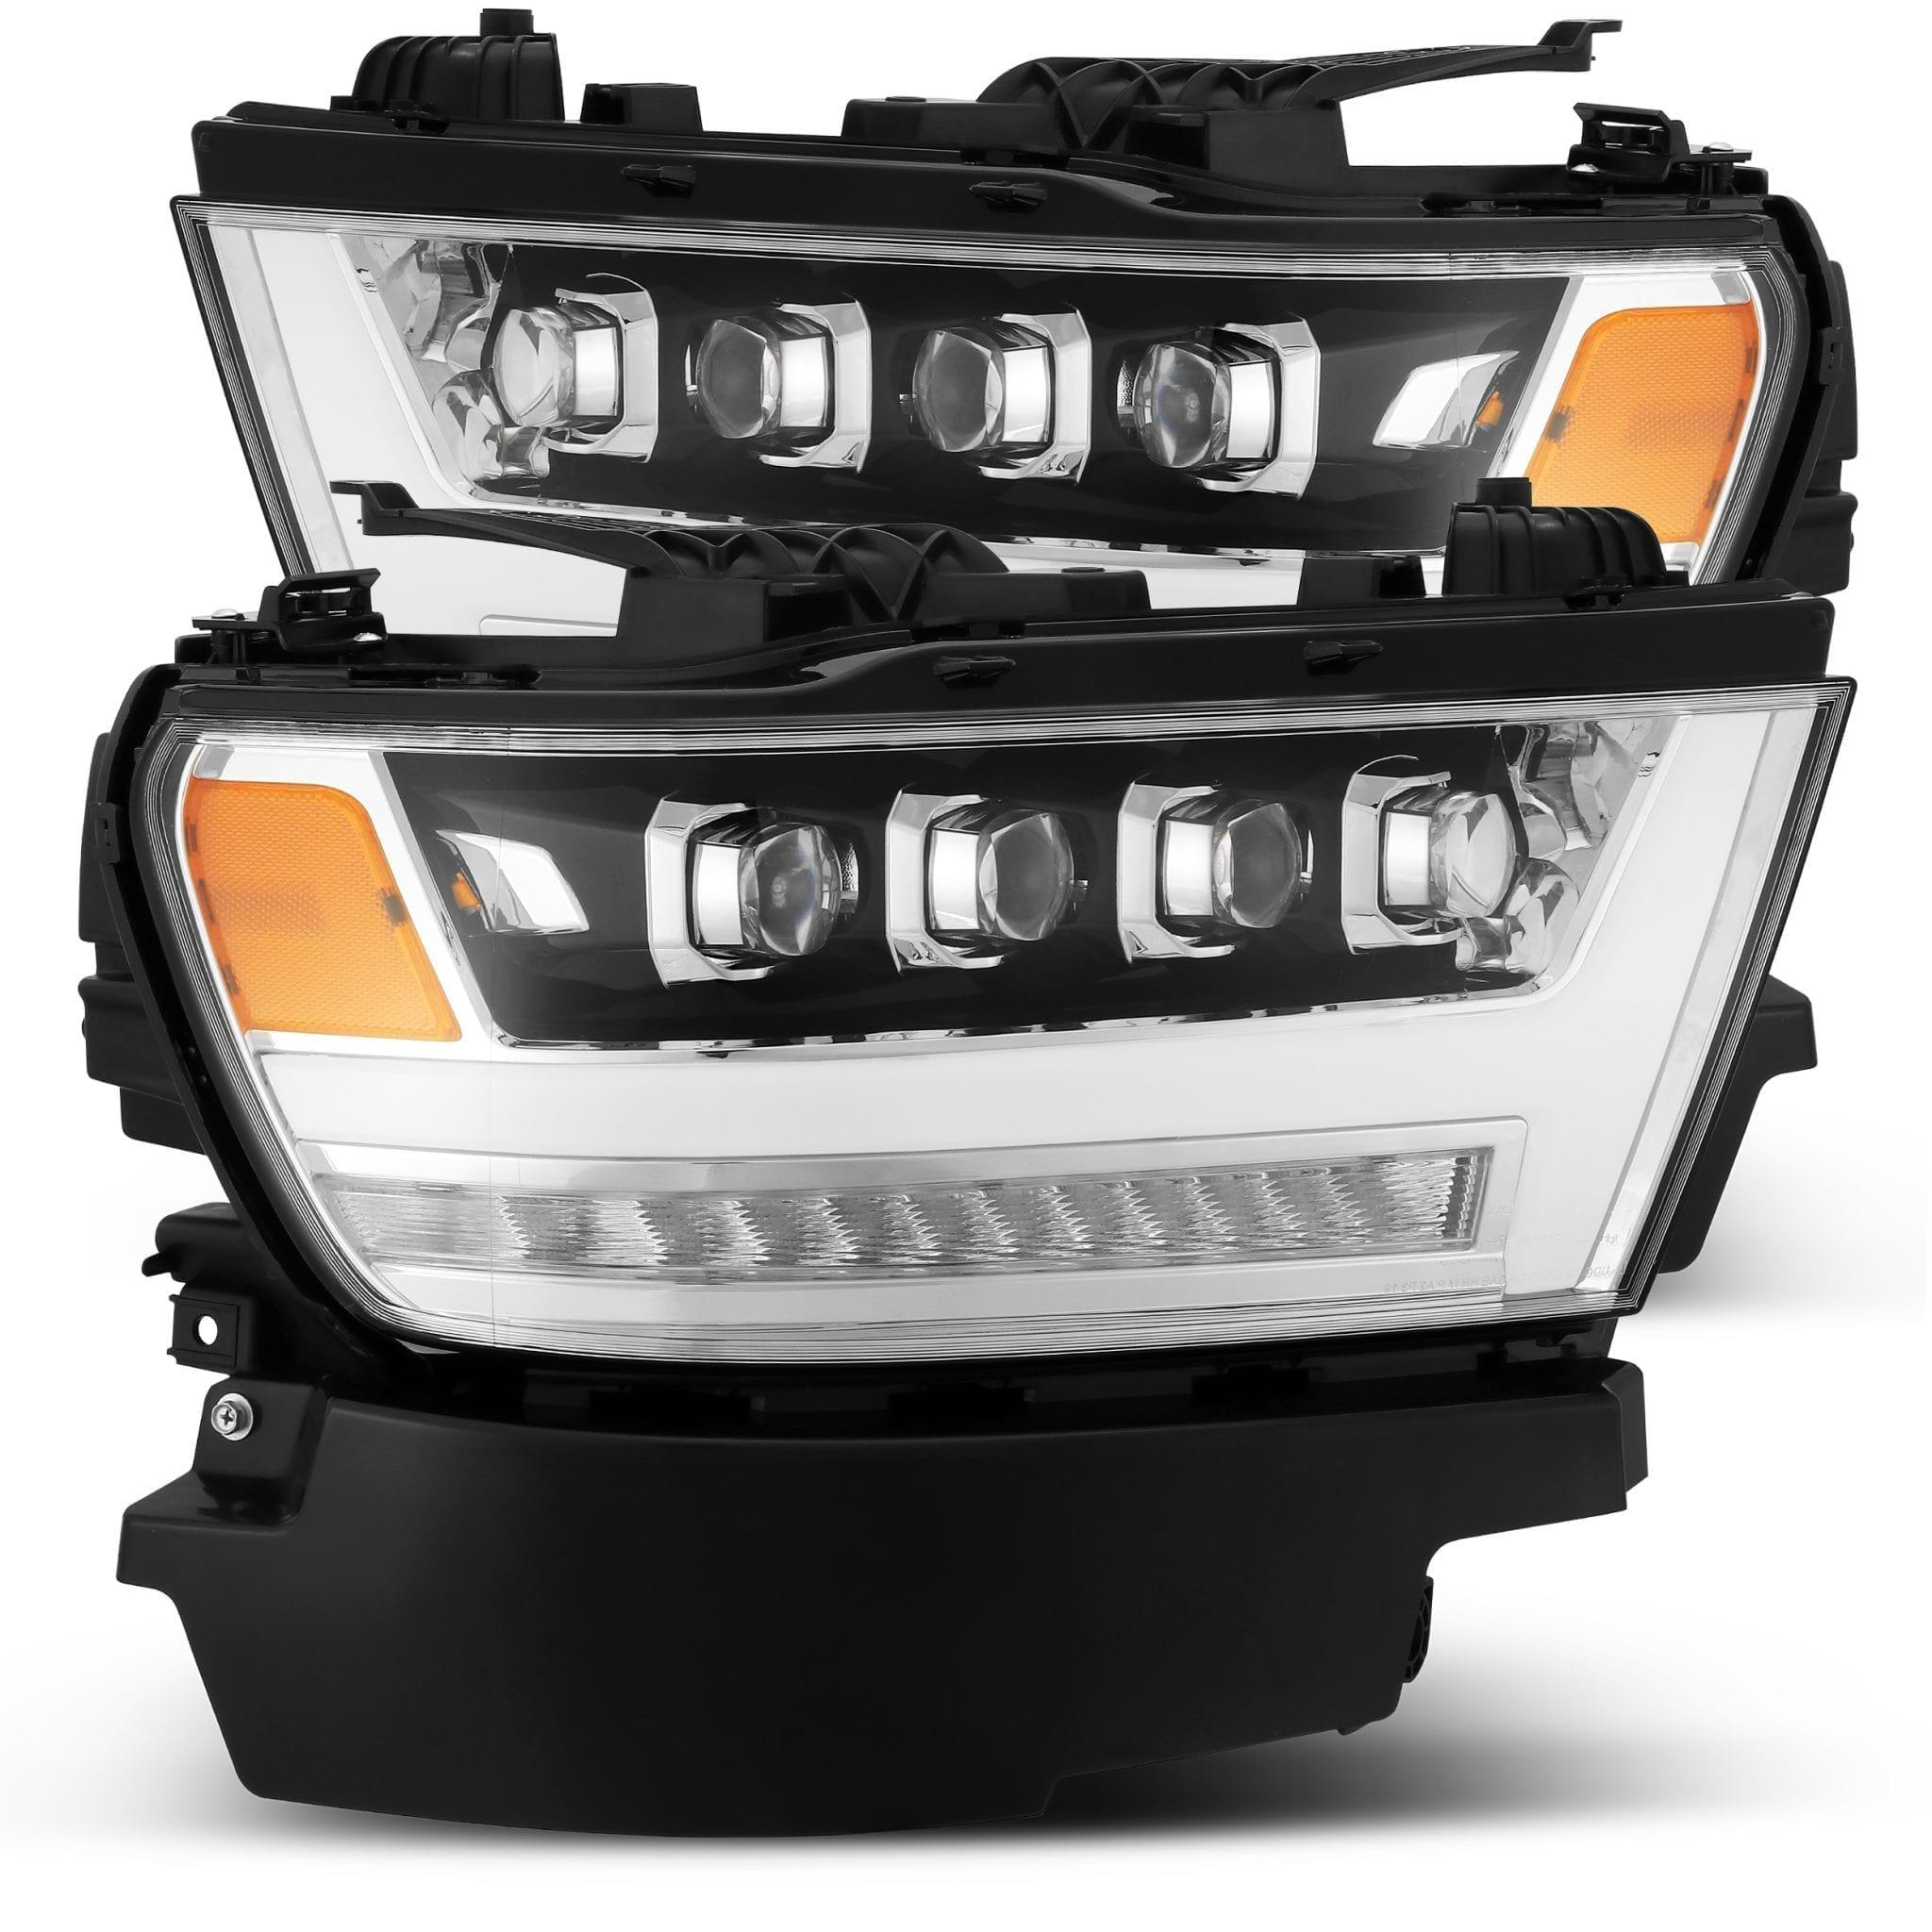 2019 2020 Ram 1500 NOVA Series LED Projector Headlights Chrome